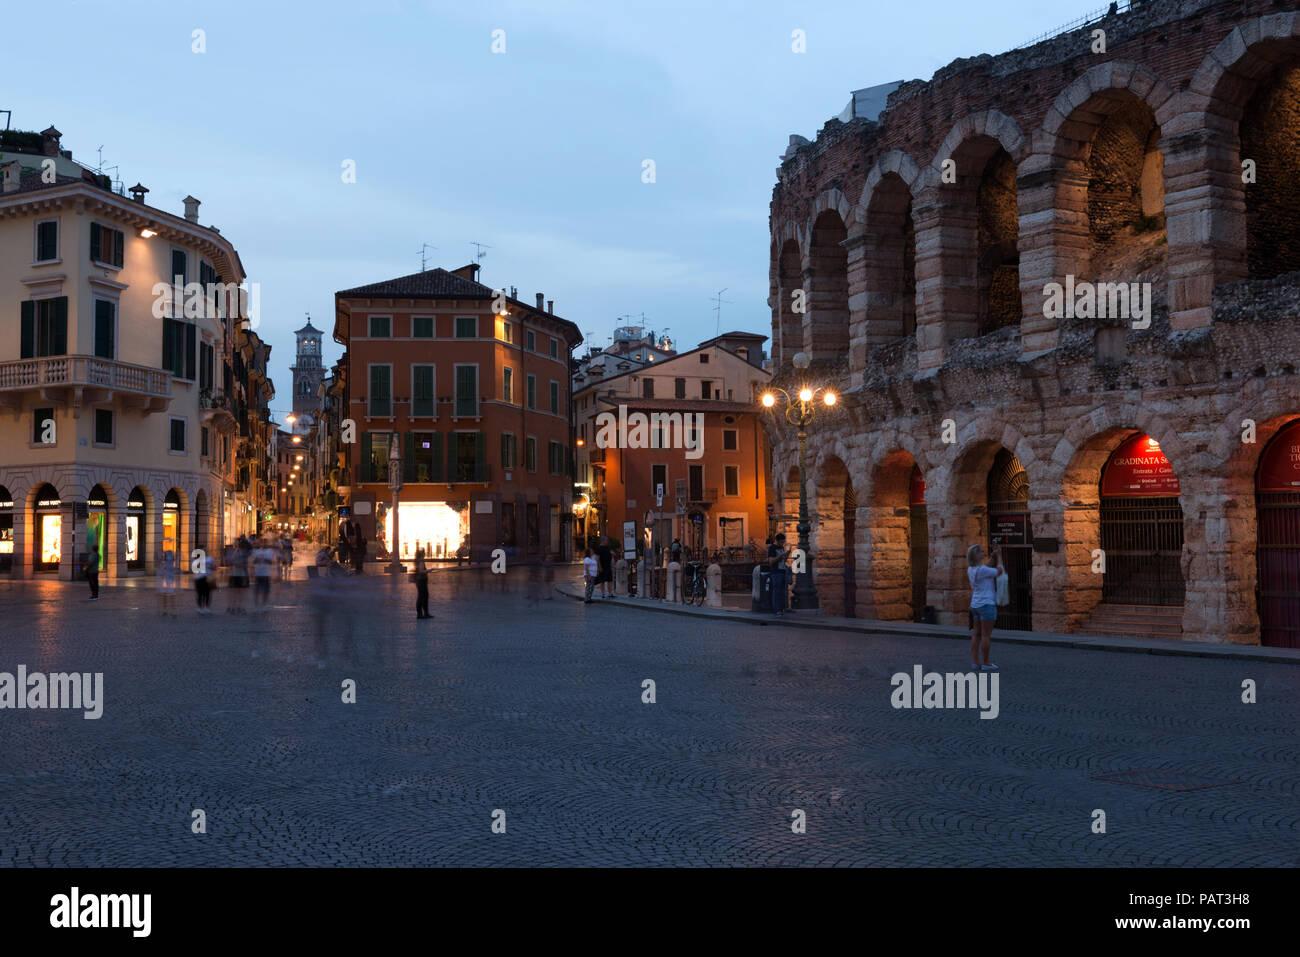 The Verona Arena,Piazza Bra in Verona Verona, Veneto, Italy Stock Photo